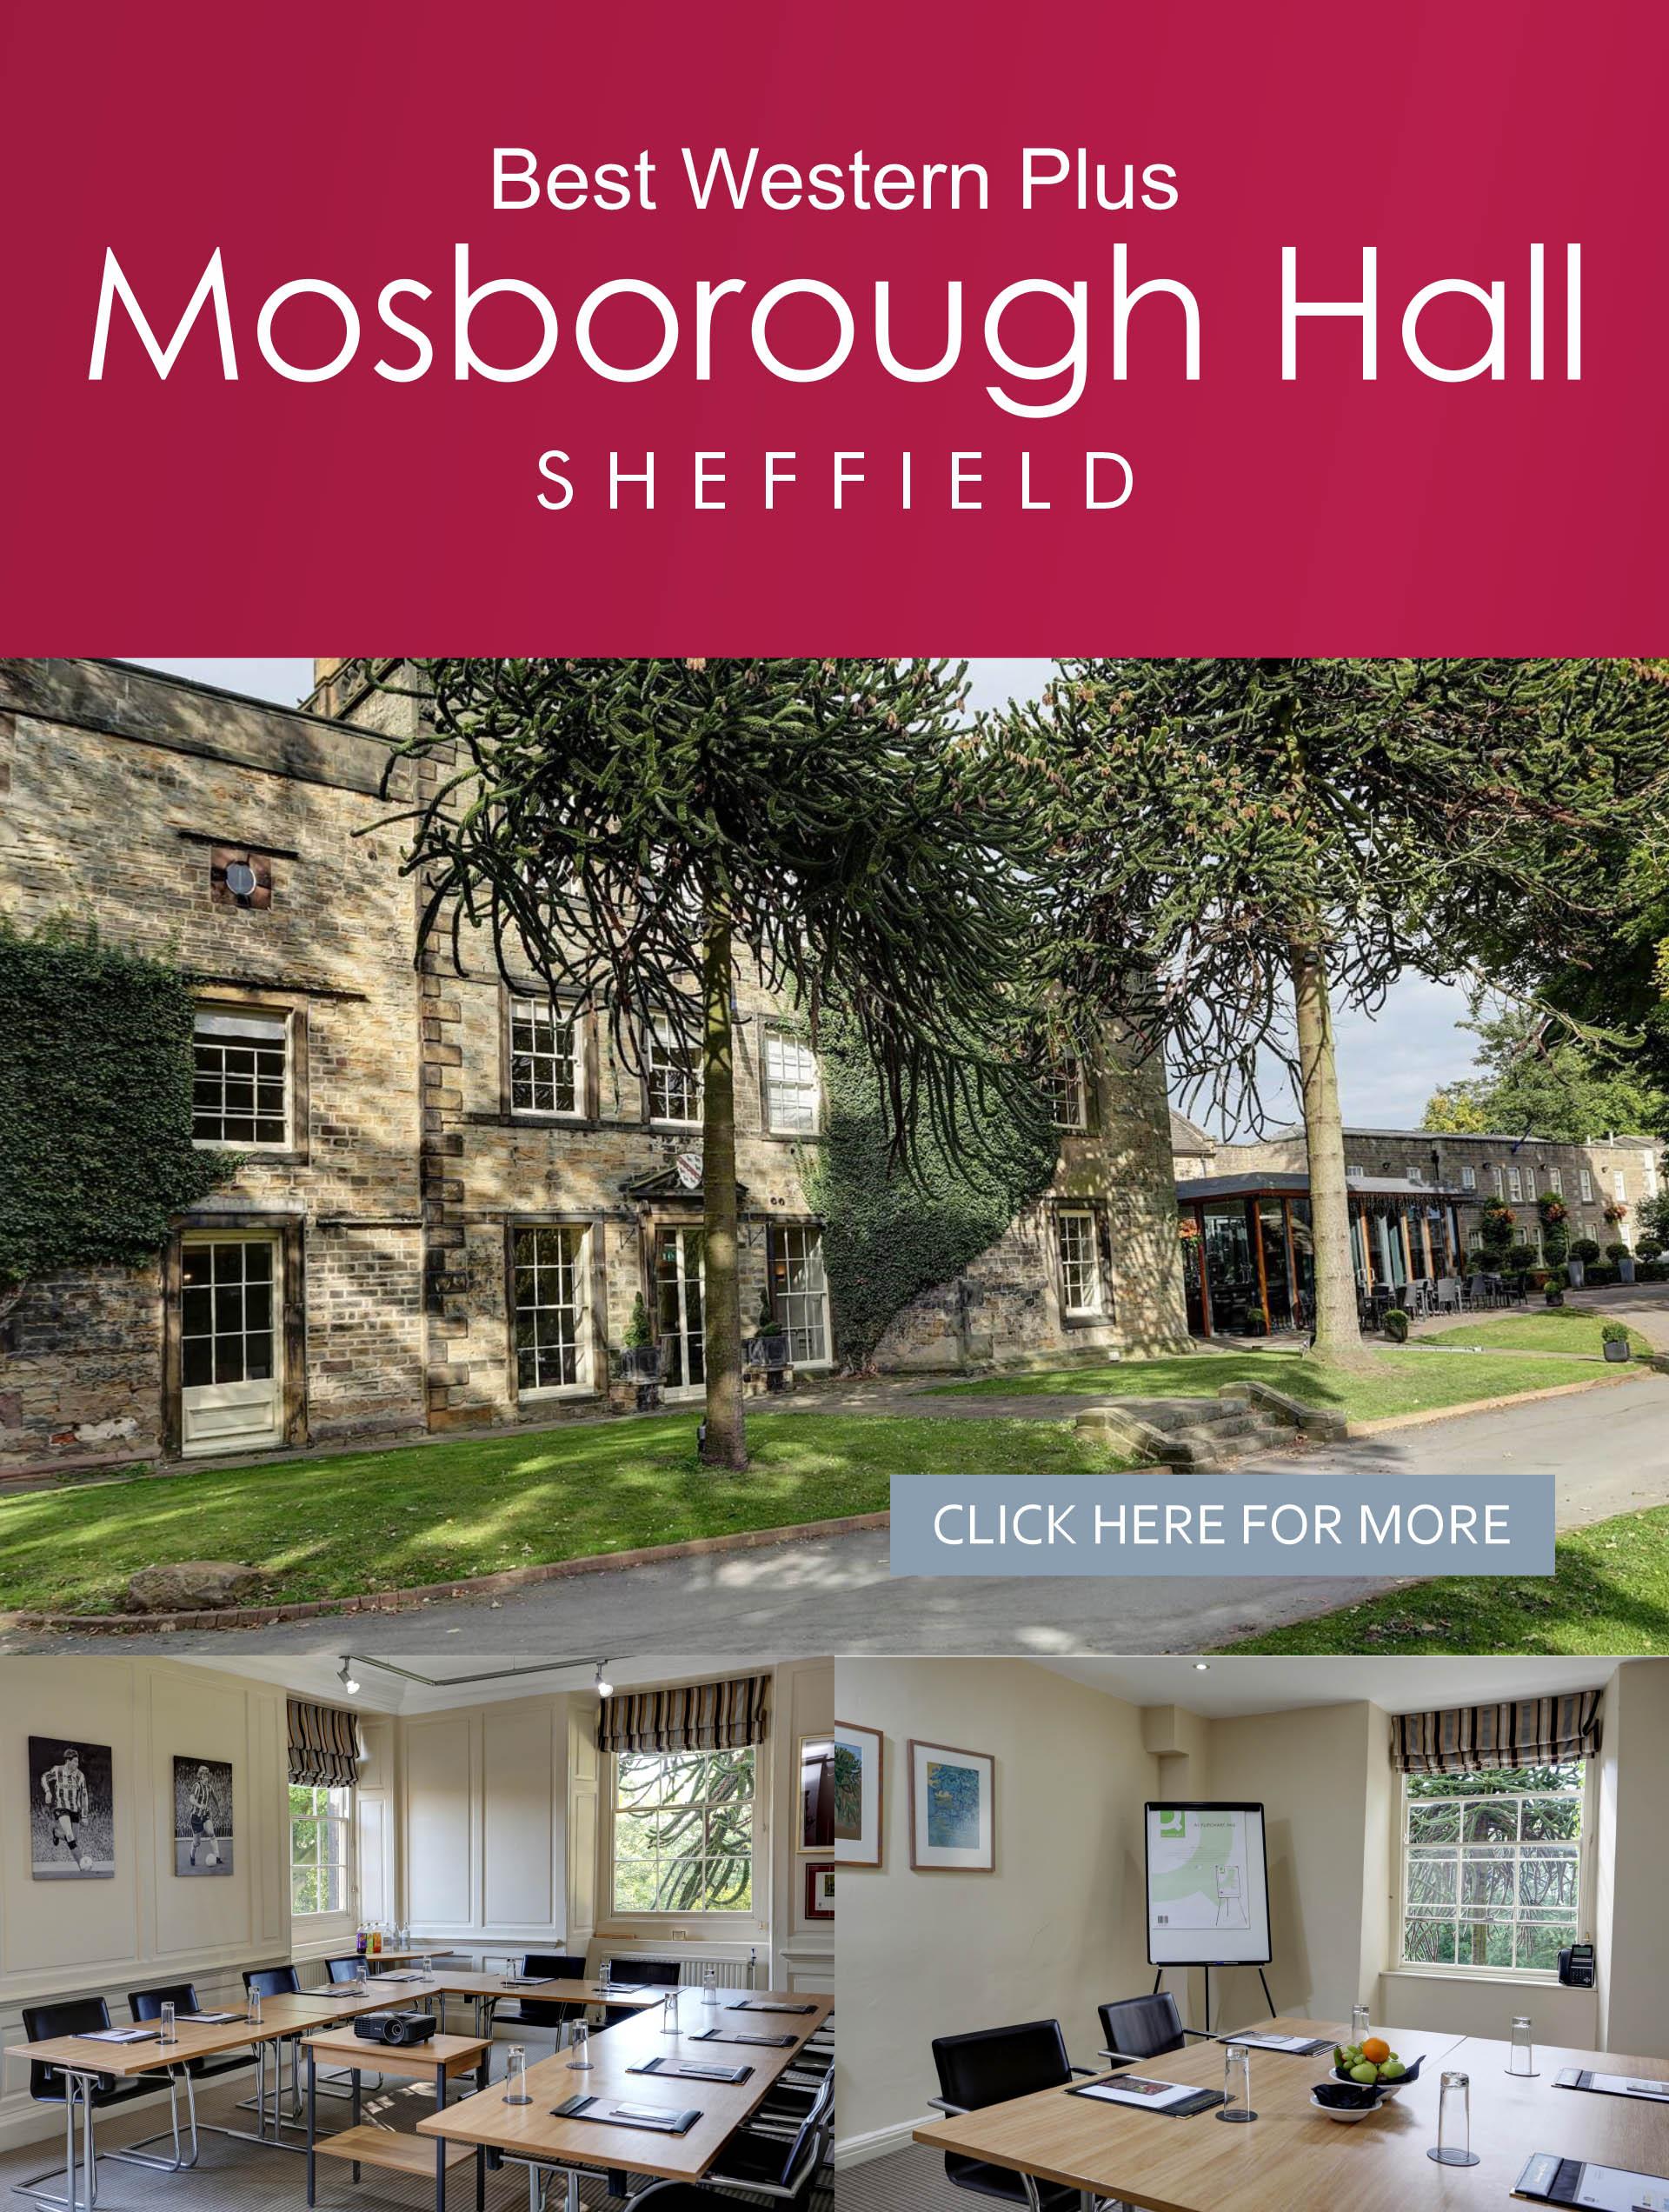 Mosborough Hotel meeting image